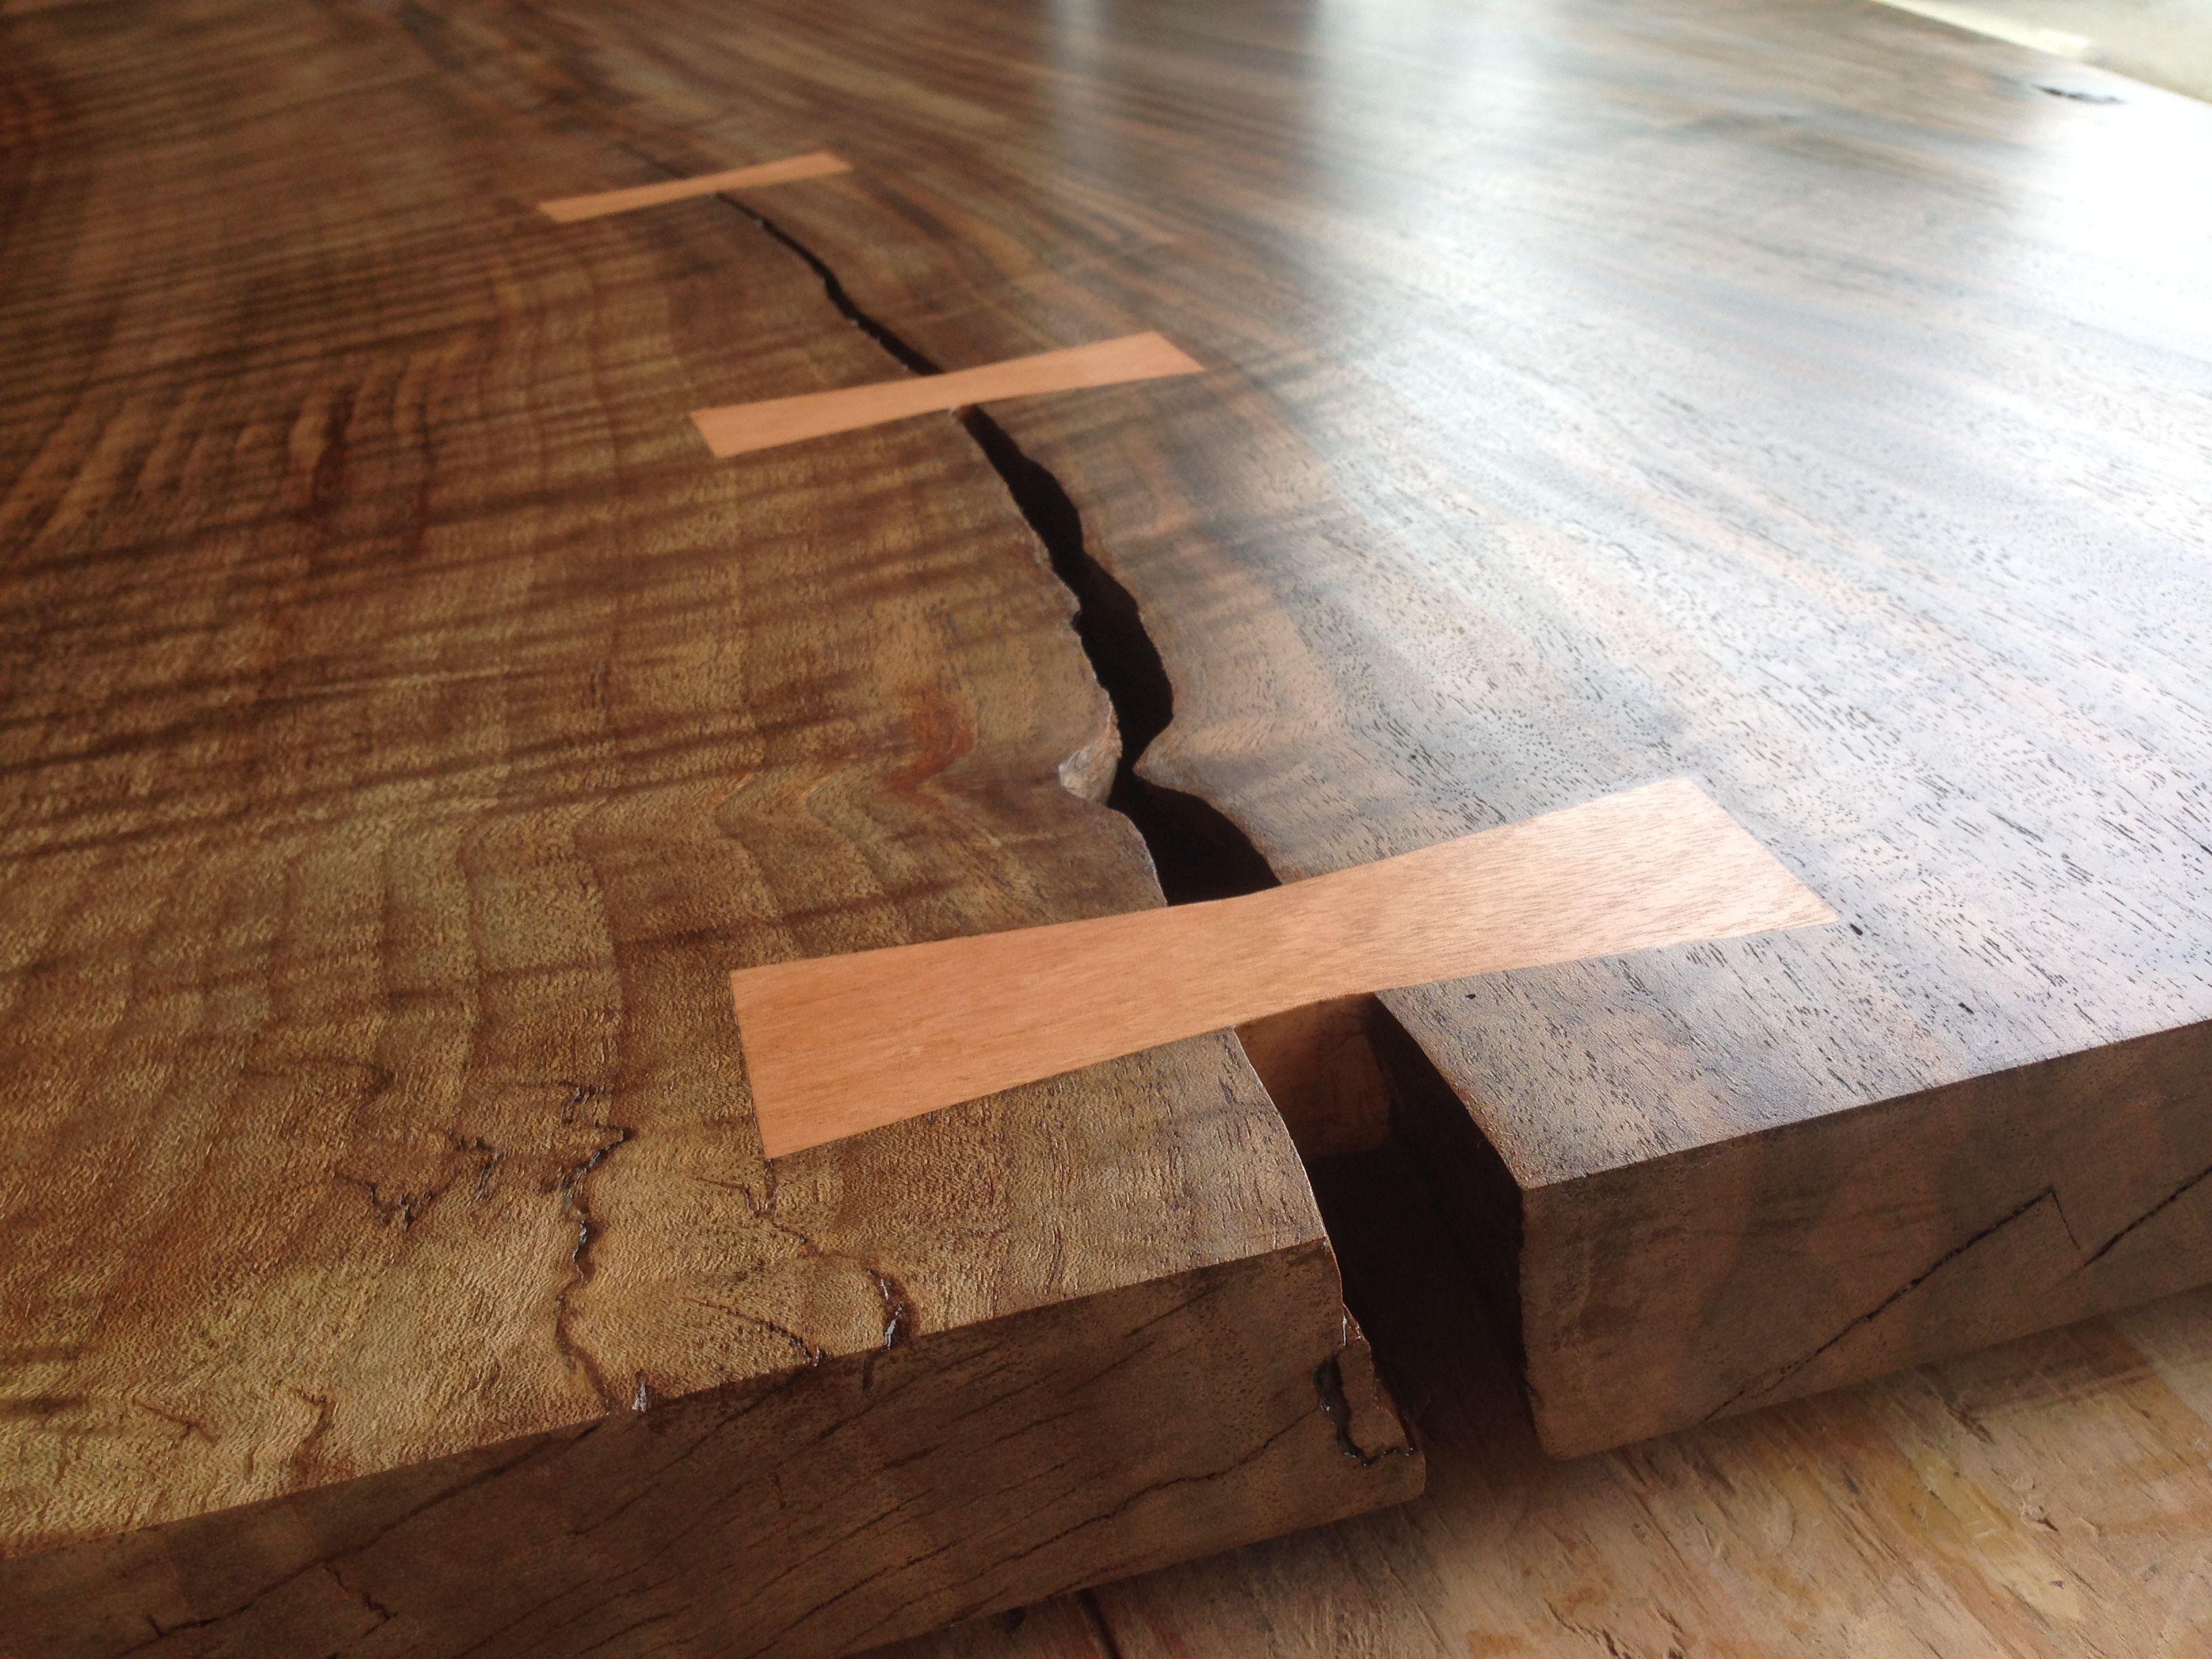 walnut wood coffee table, bowtie key detail. #coffeetable #wood